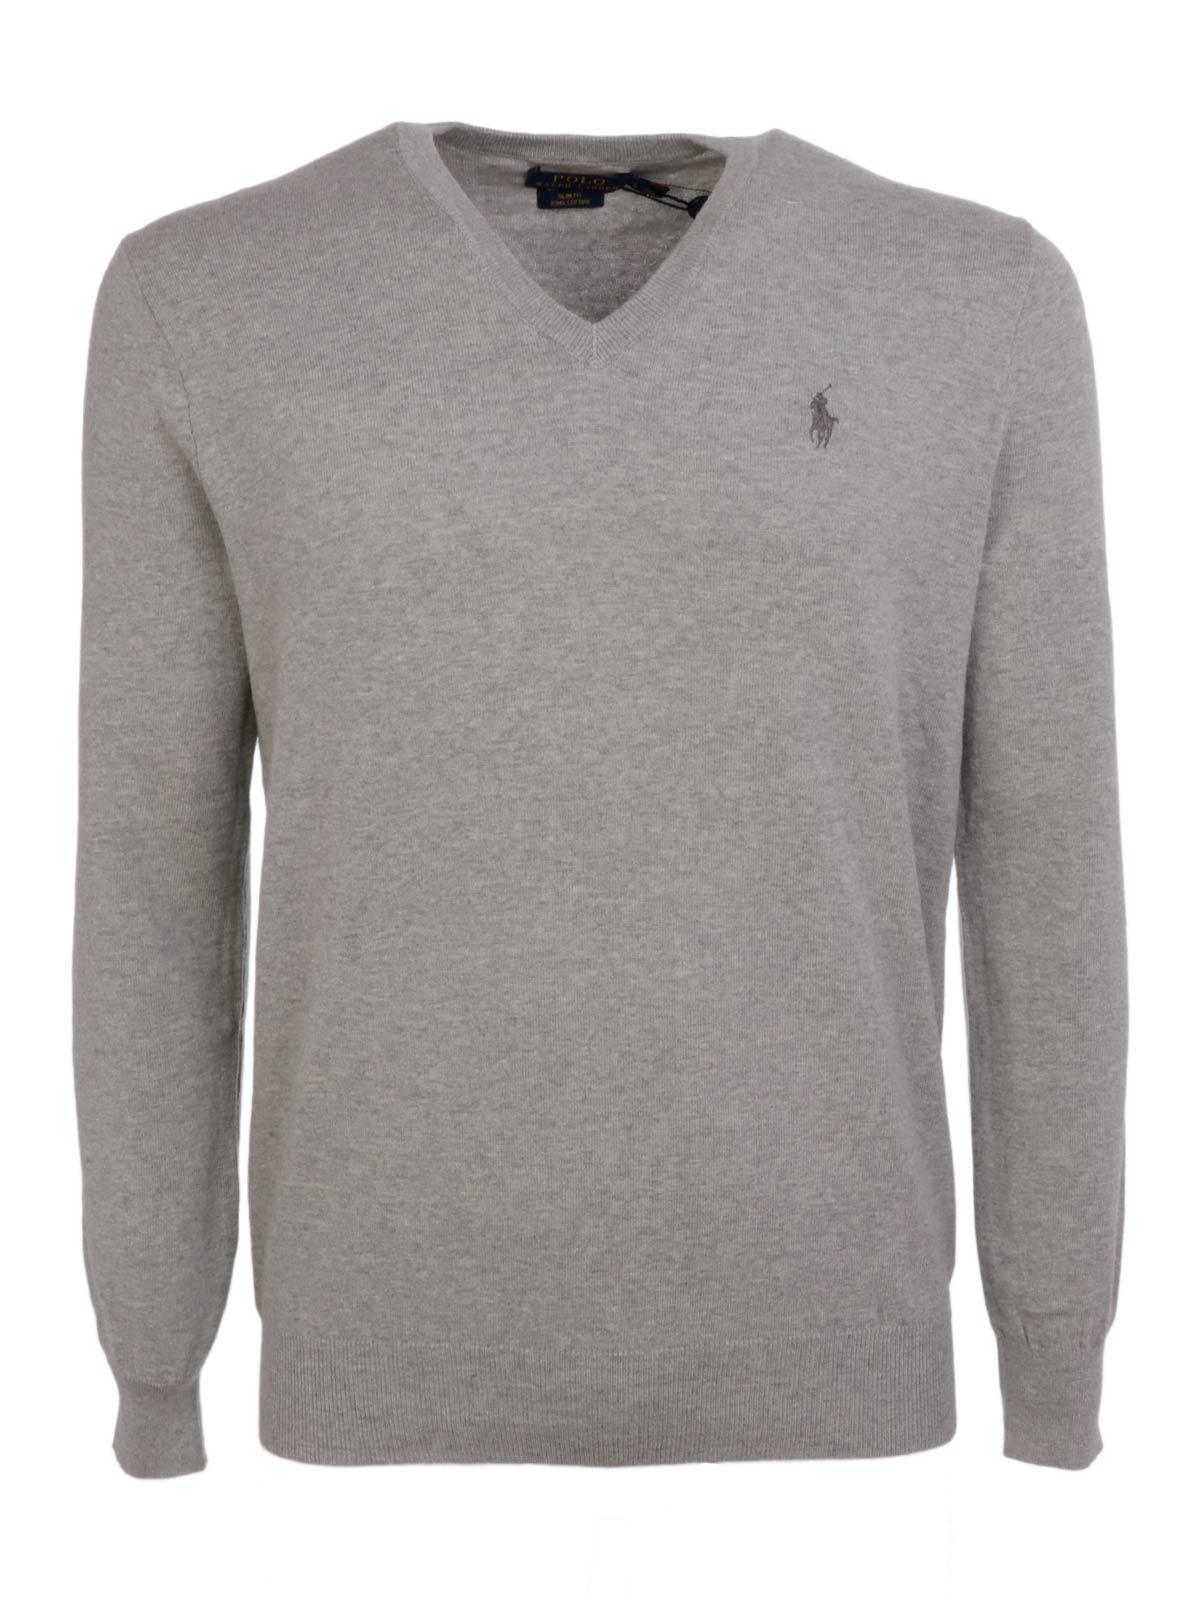 ad4a8d2de0ef POLO RALPH LAUREN Men s V-neck Sweater Andover Heather ...